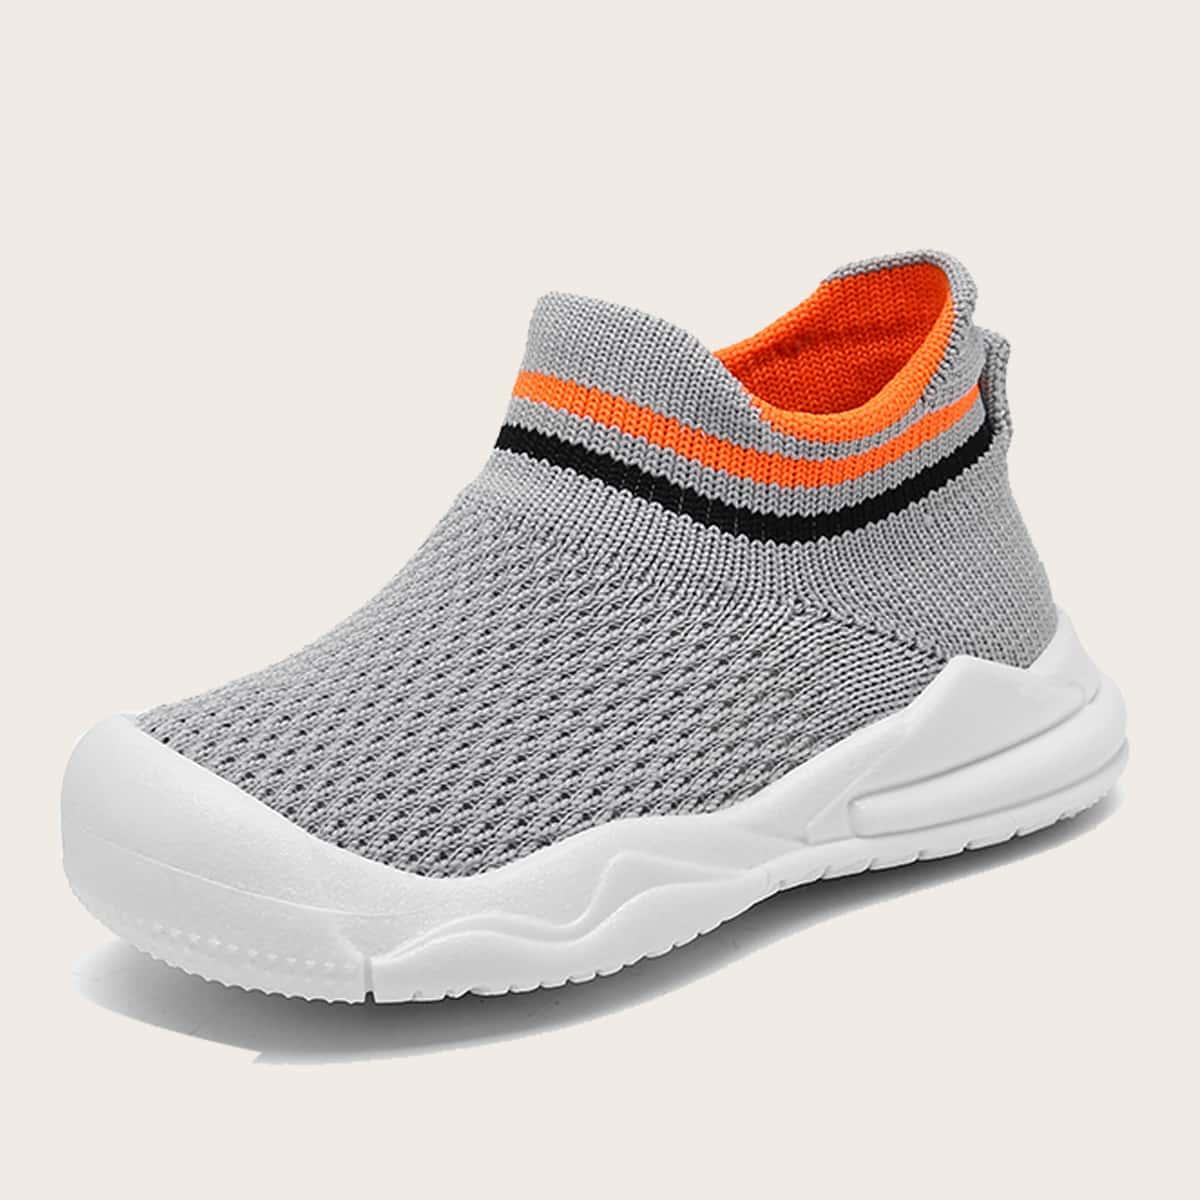 SHEIN Gestreept Baby sneaker